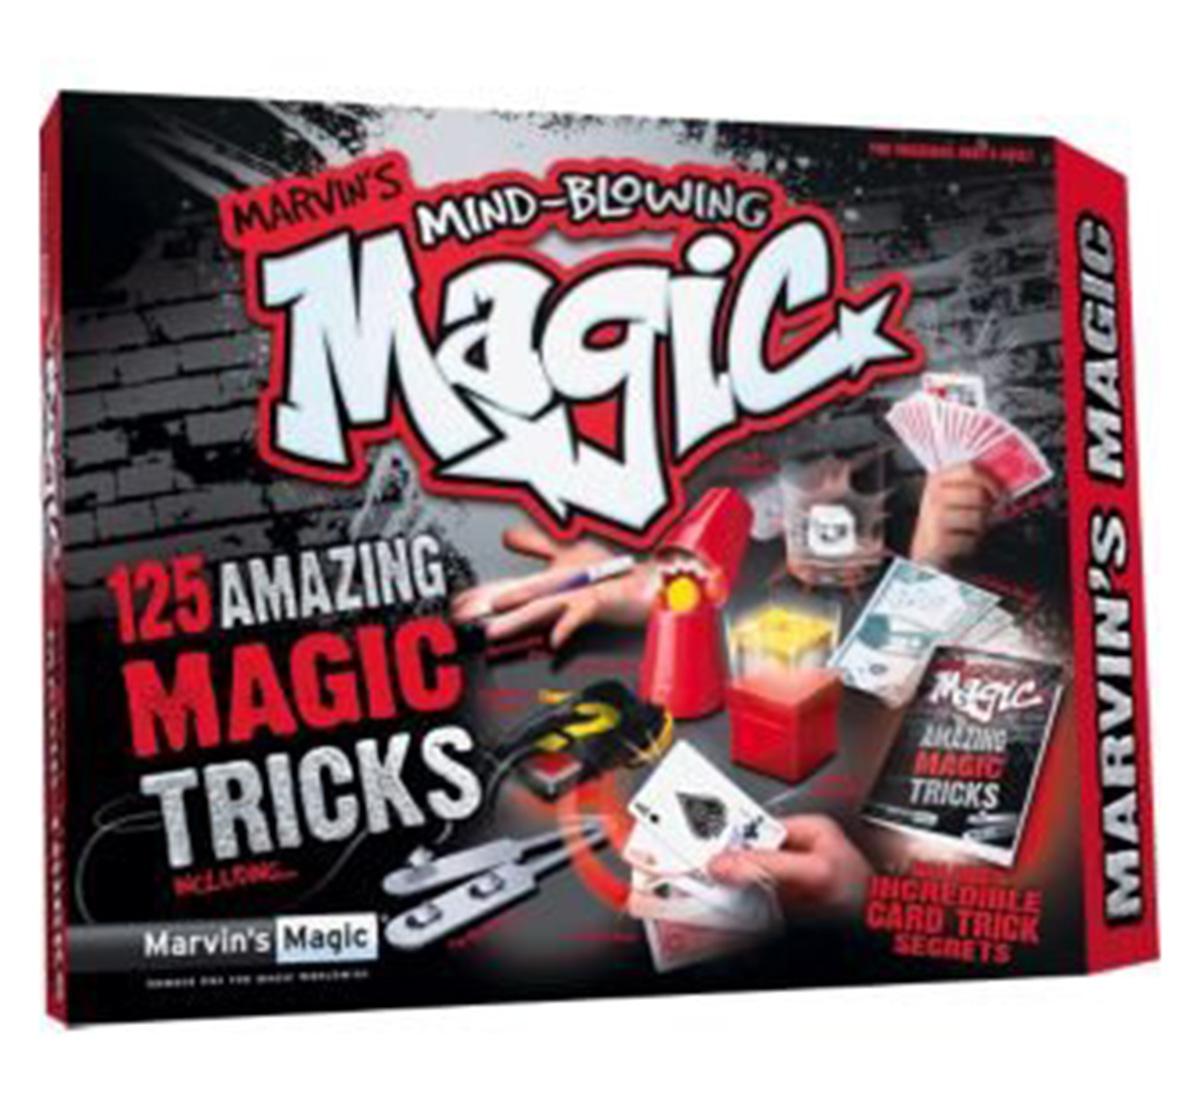 Marvin's Magic | Marvin'S Magic Mind Blowing 125 Tricks